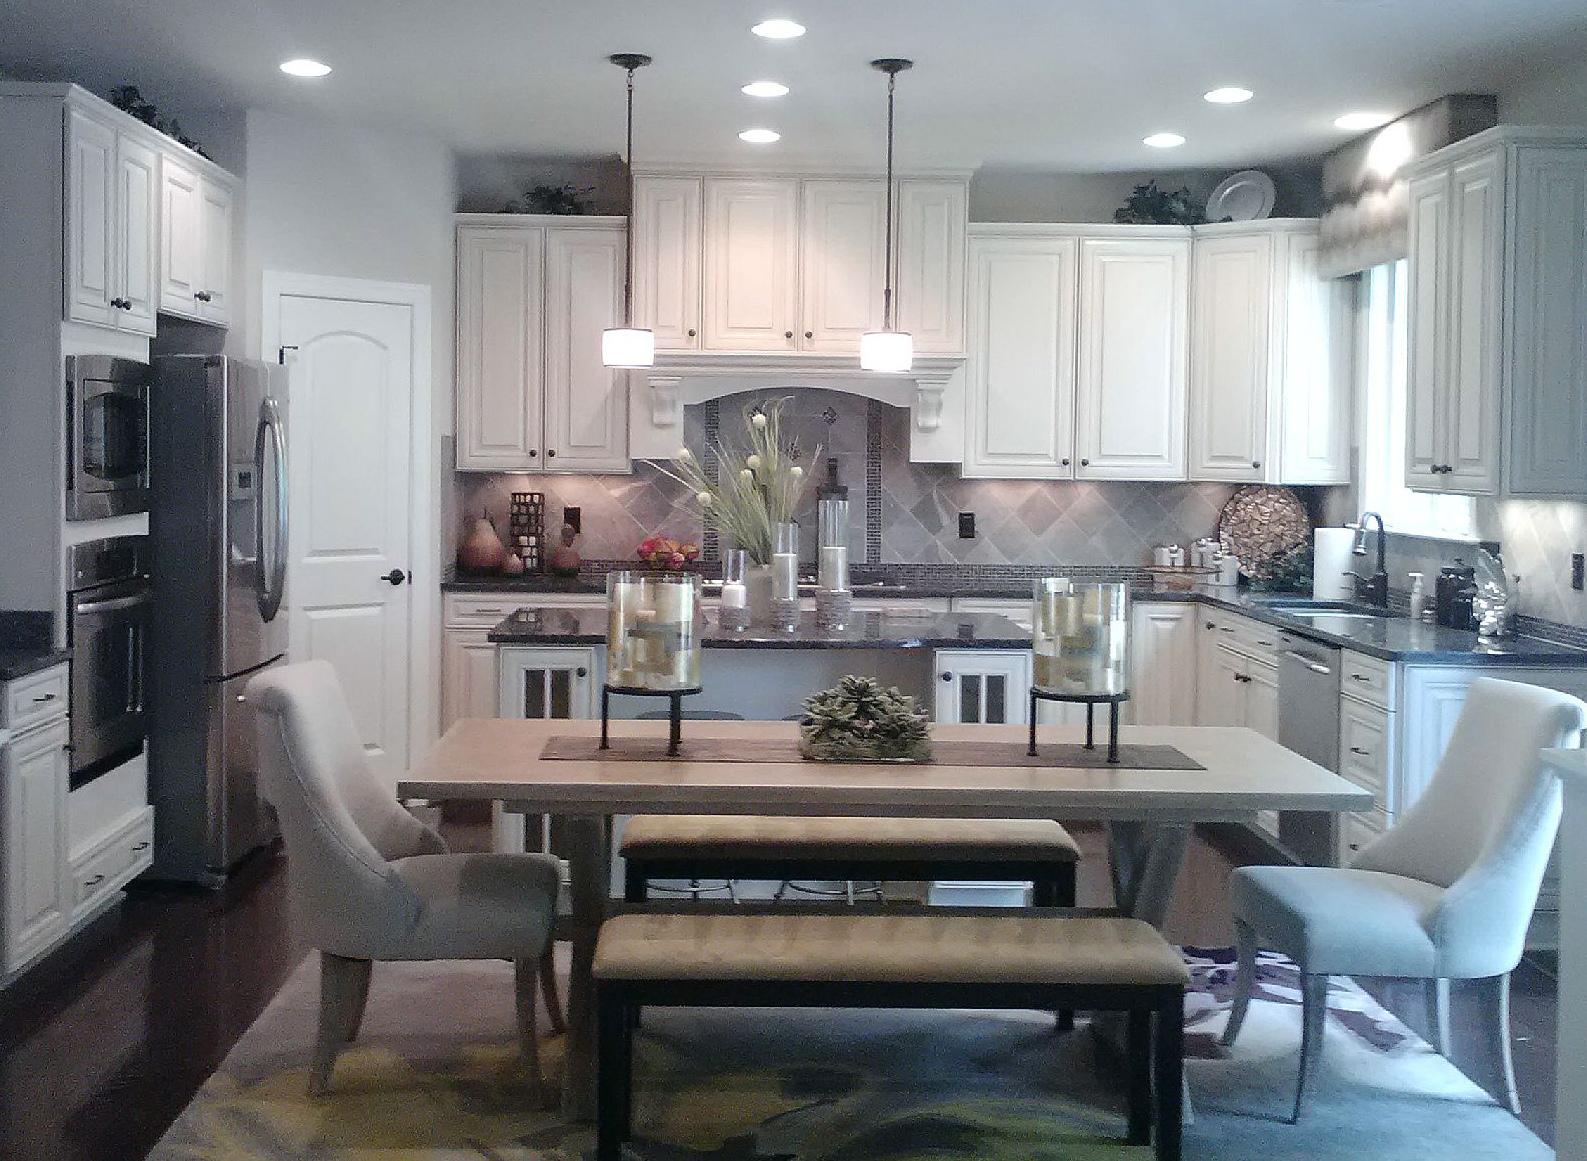 Furniture Sales In Va Model Home Furniture Sales Northern Virginia Home Decor Furniture Deals